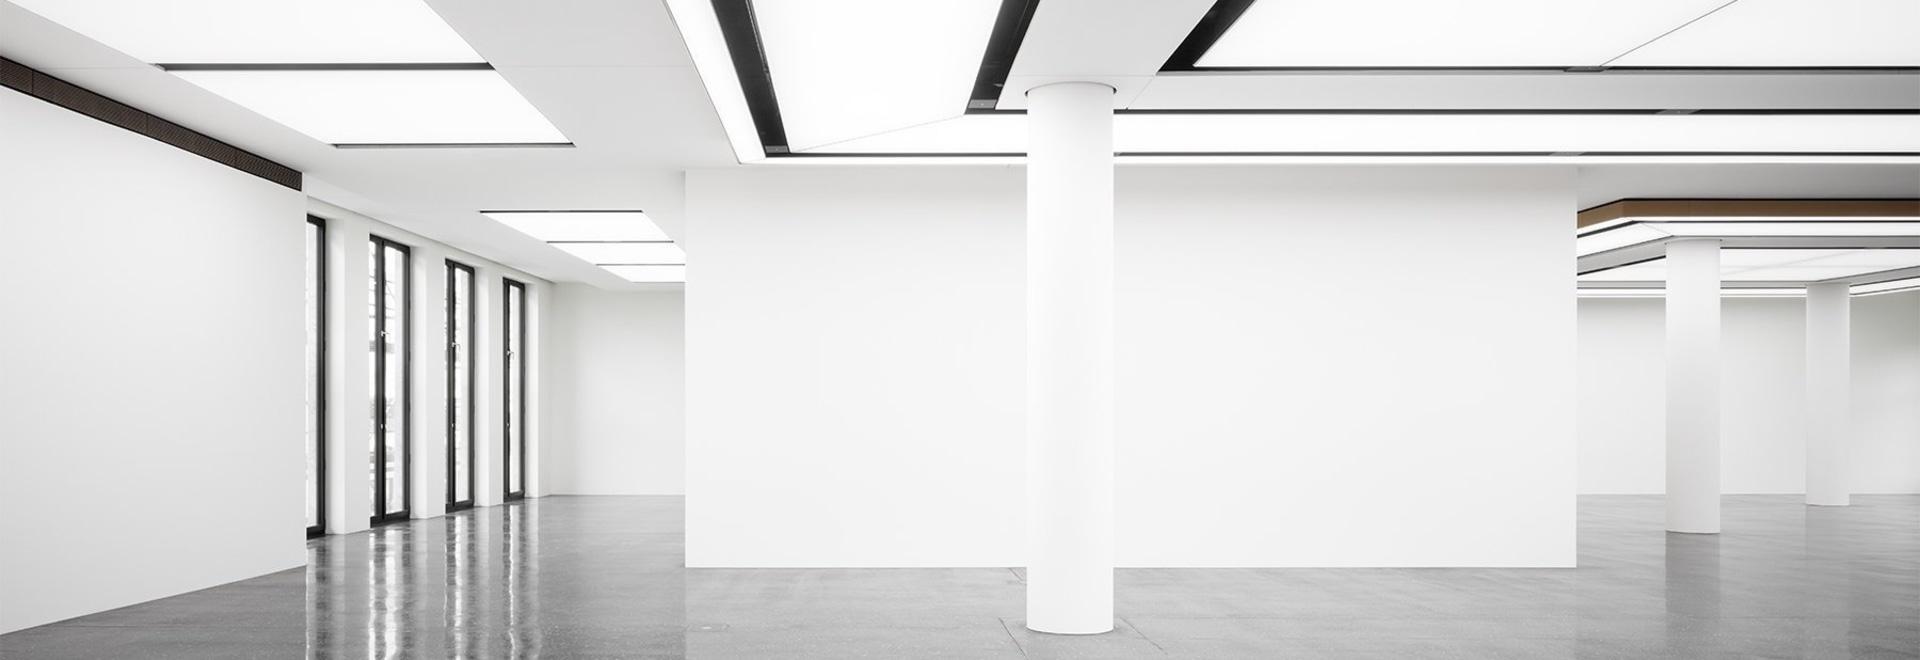 gmp architekten's art museum renovation opens in new development in hamburg